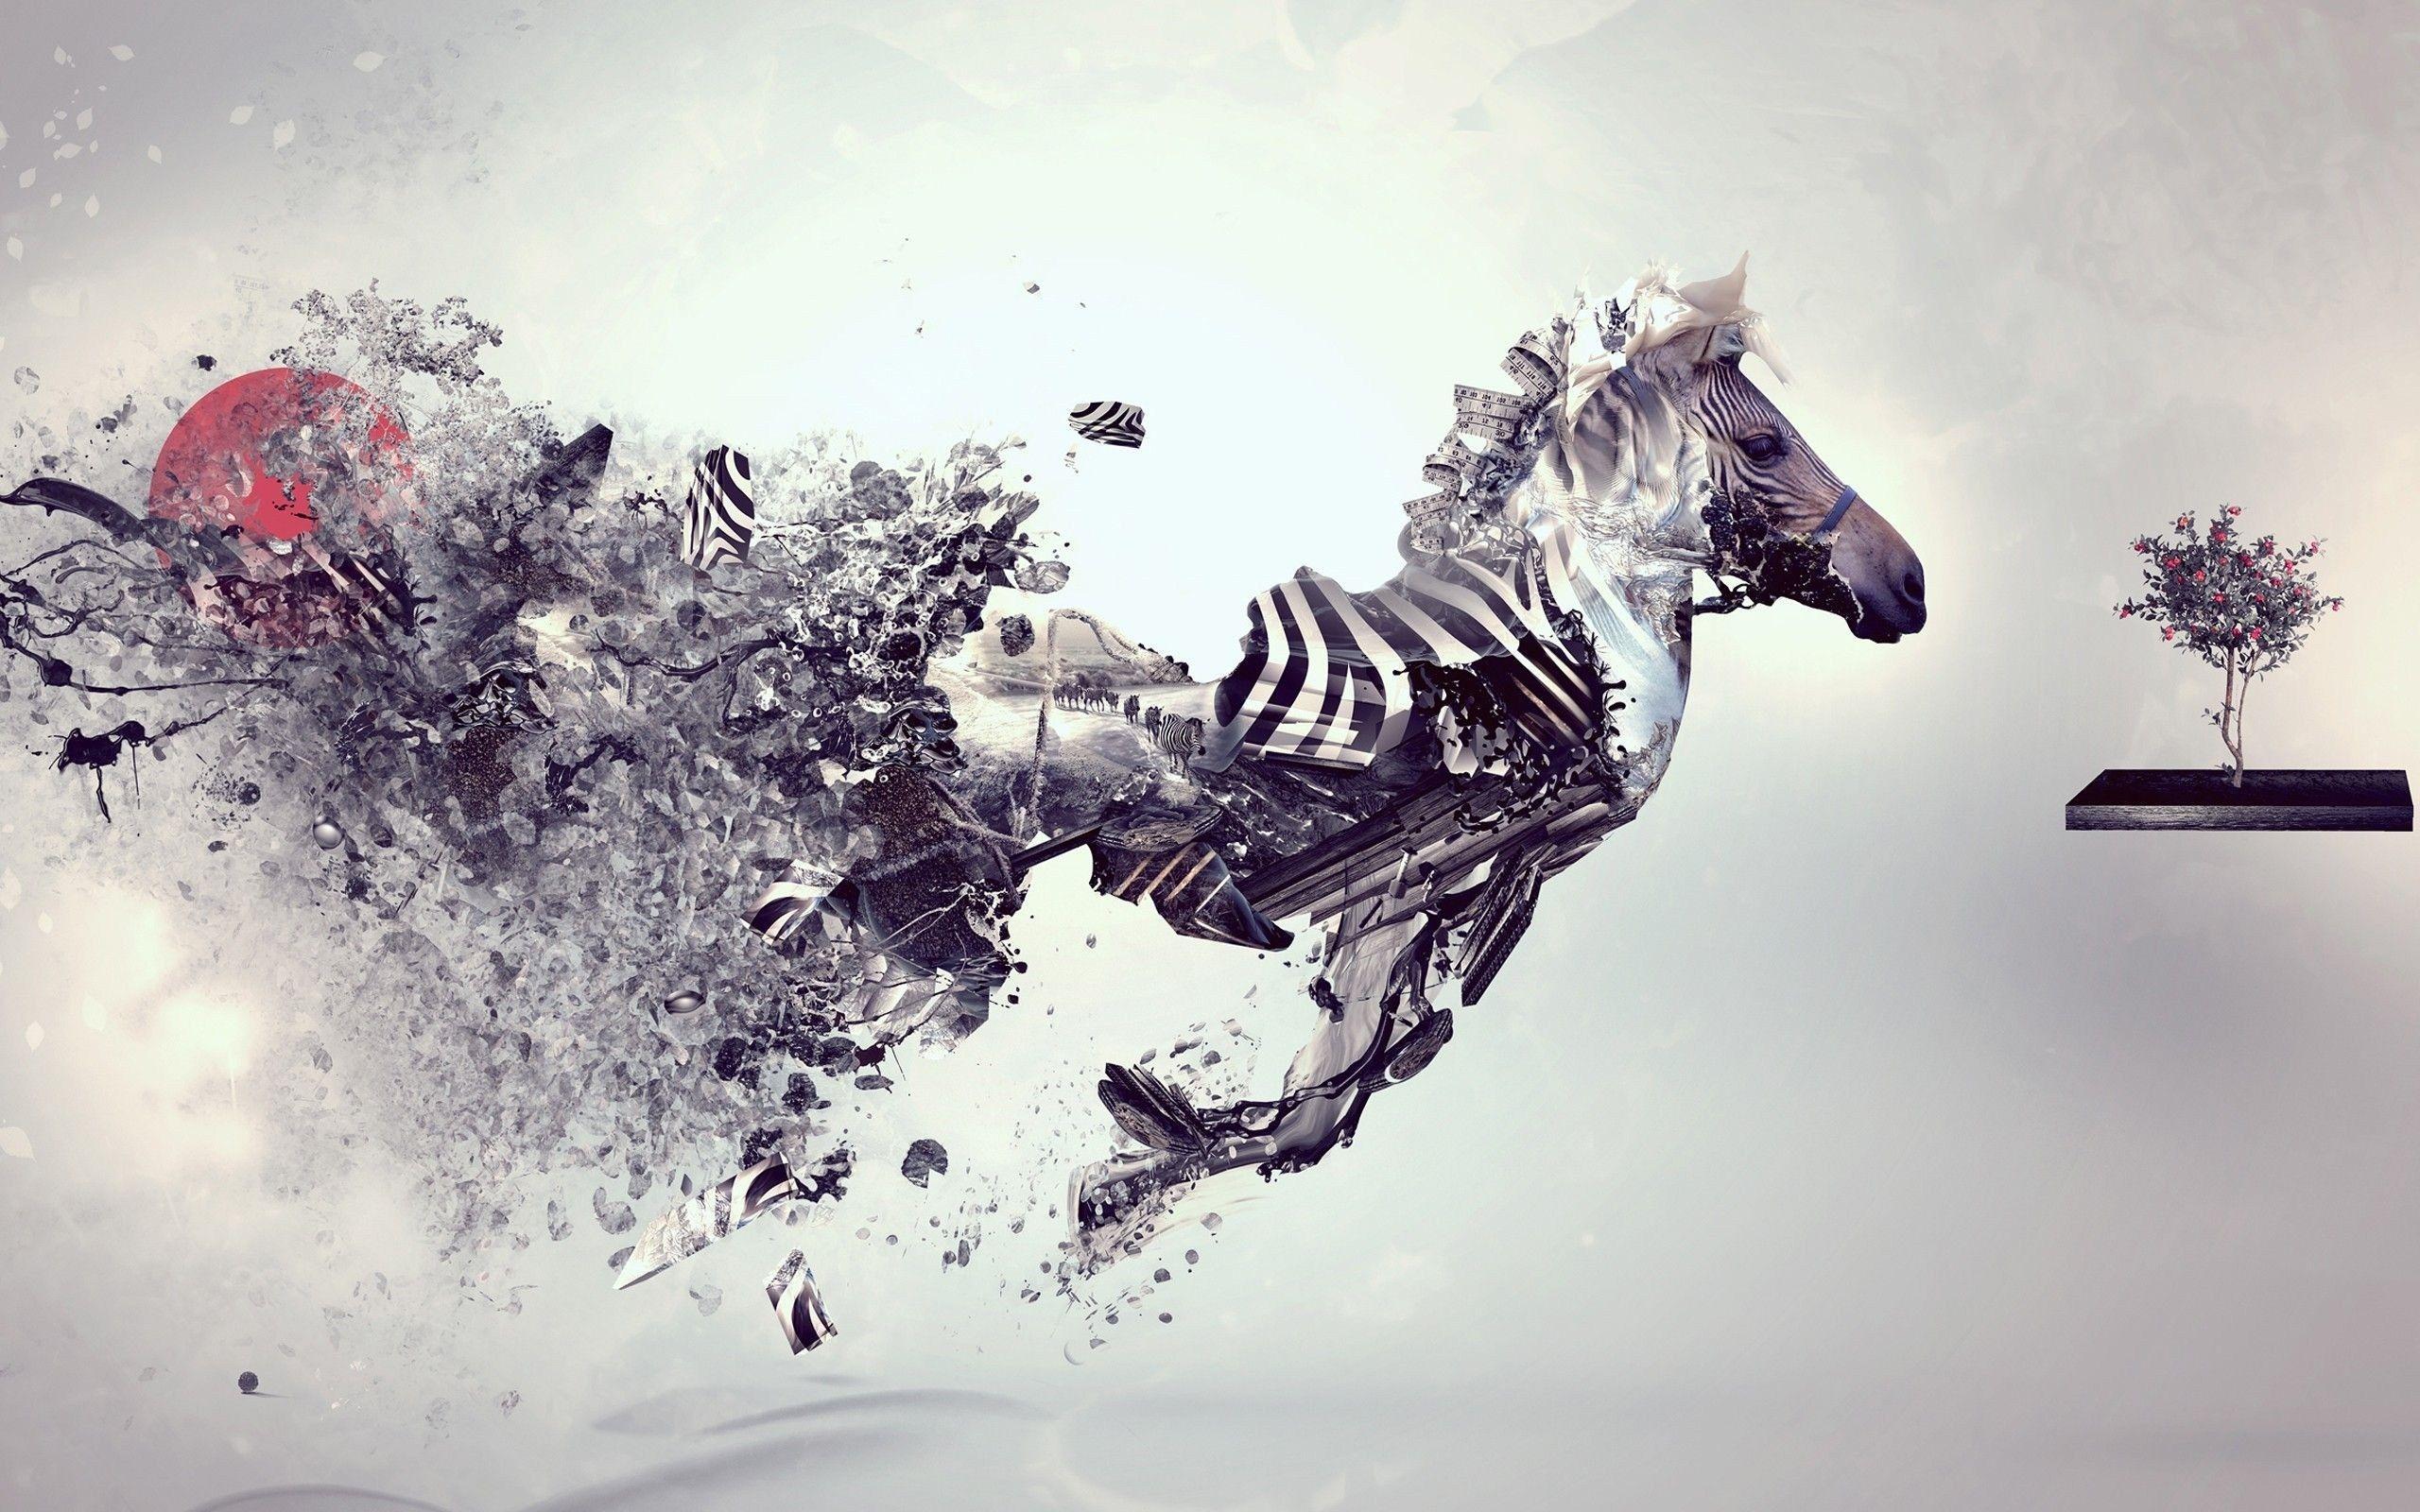 Artistic Desktop Wallpapers Top Free Artistic Desktop